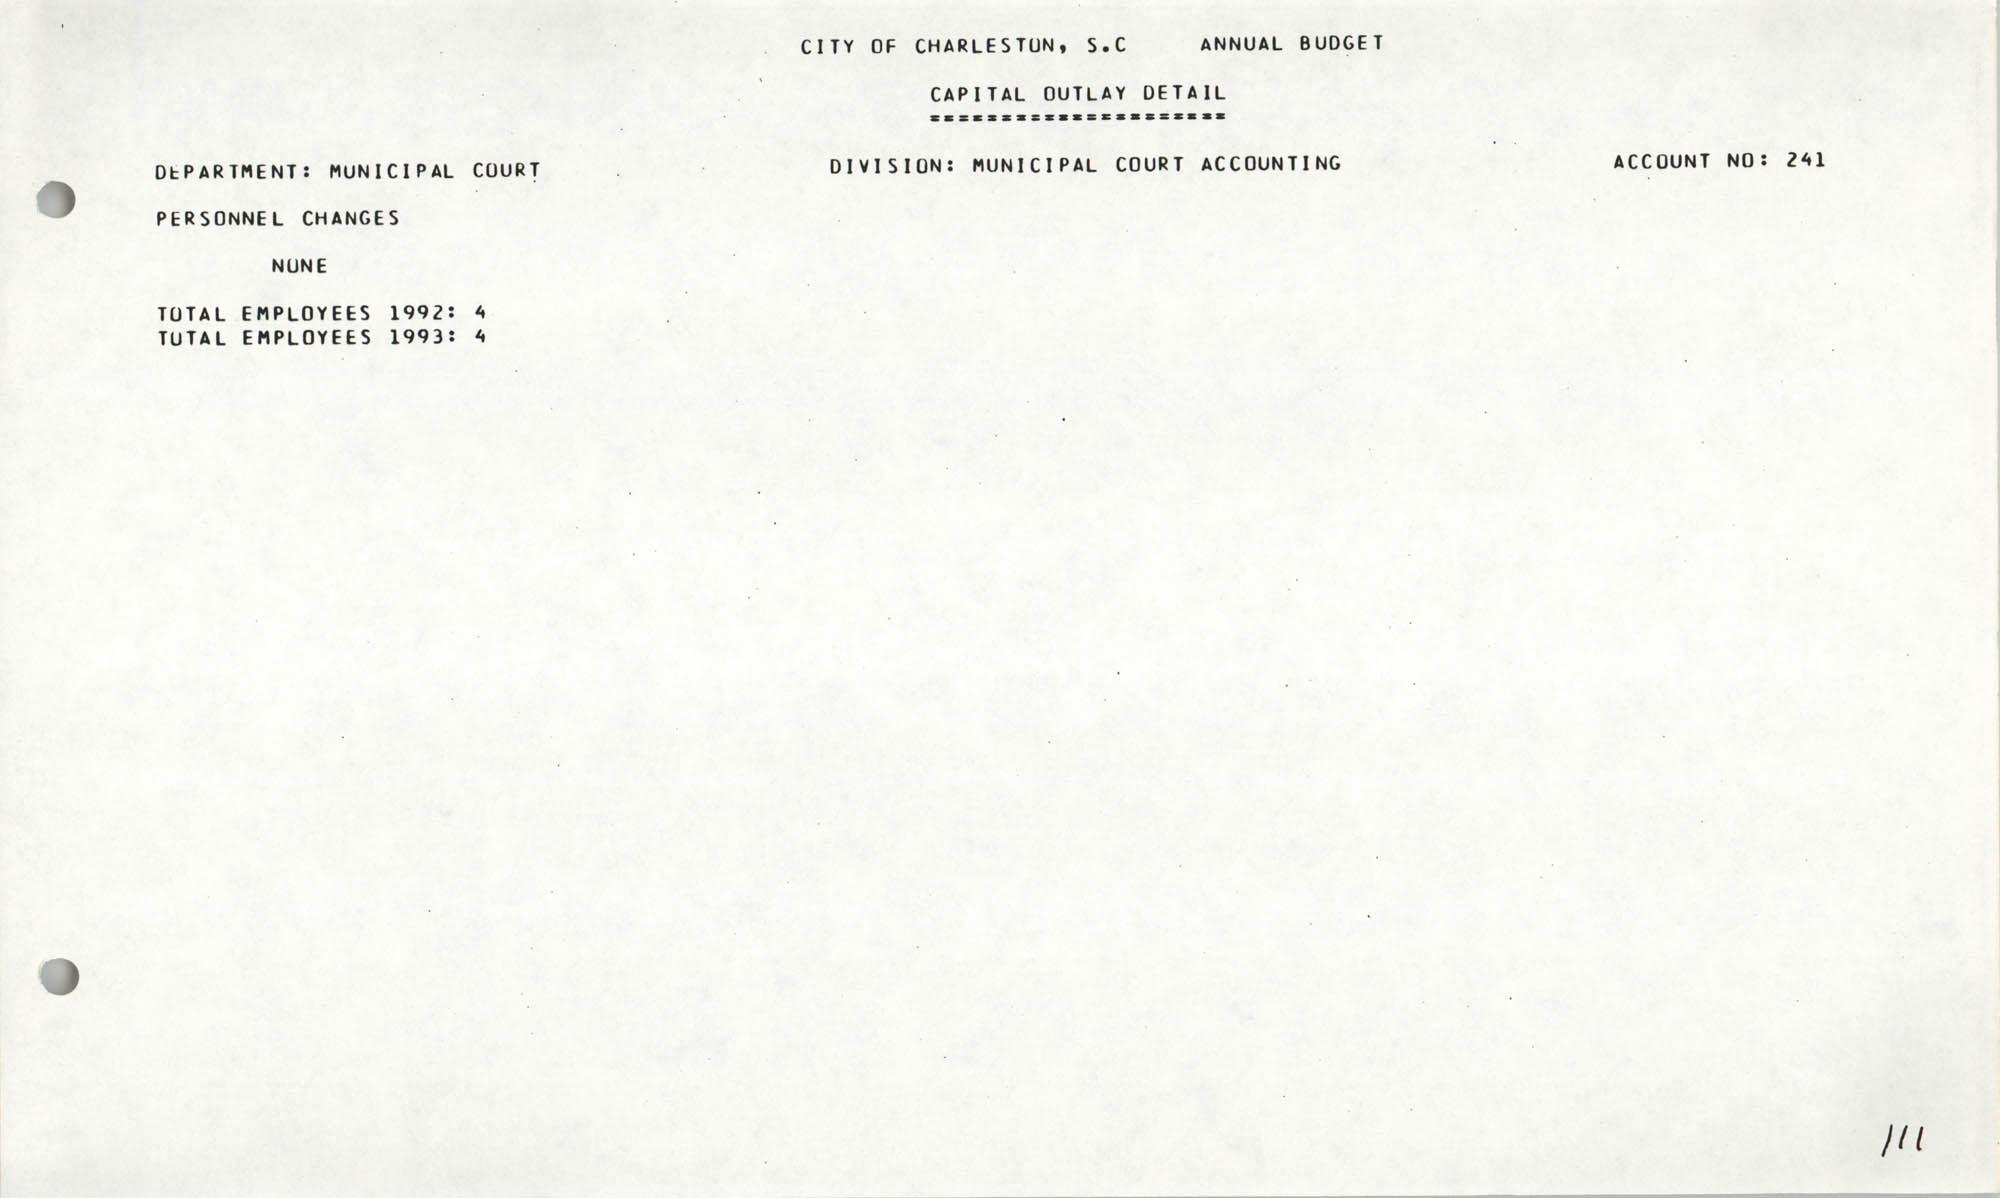 The City Council of Charleston, South Carolina, 1993 Budget, Page 111